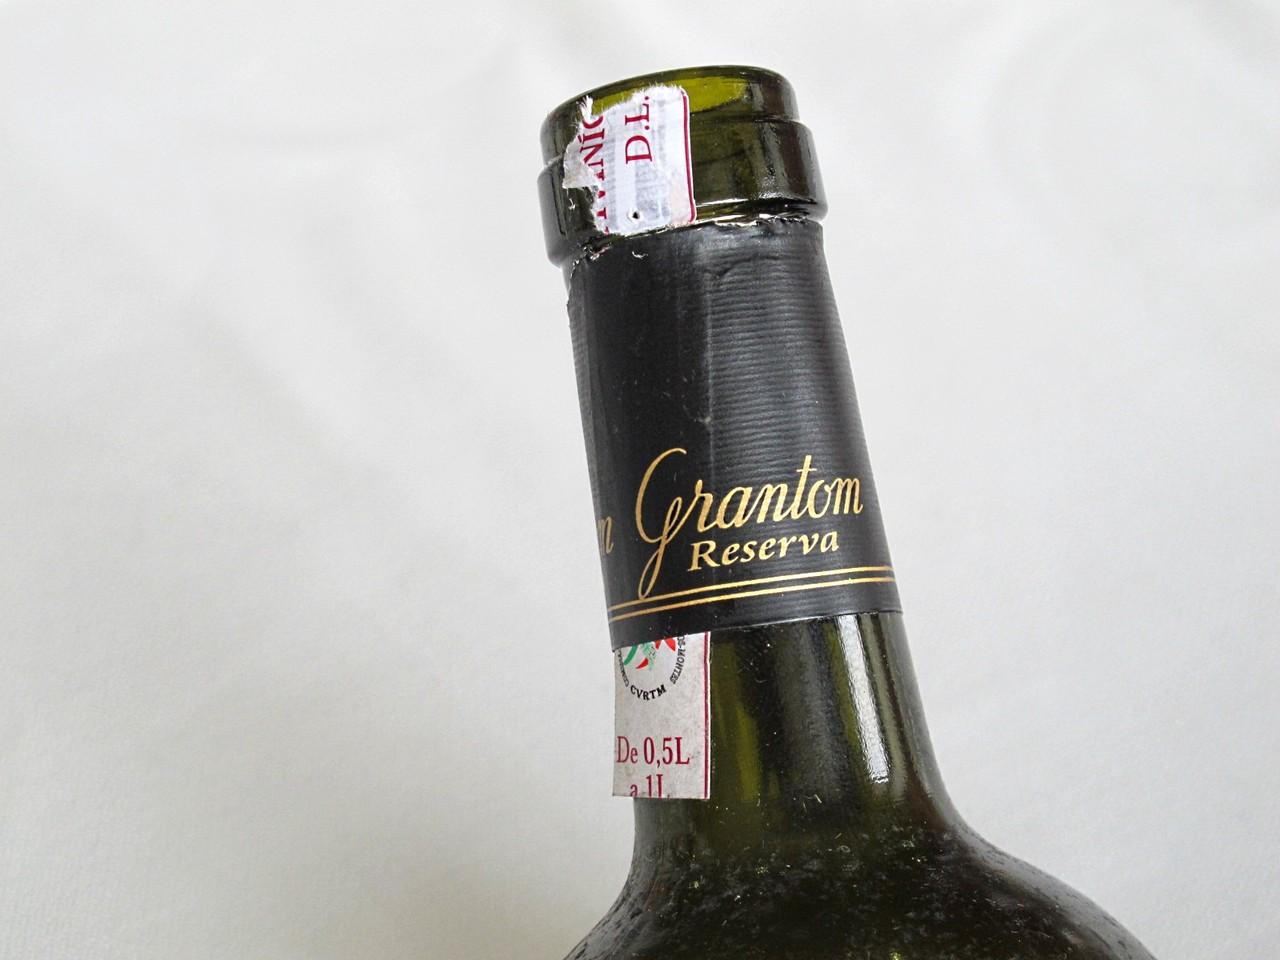 Grantom tinto 2001